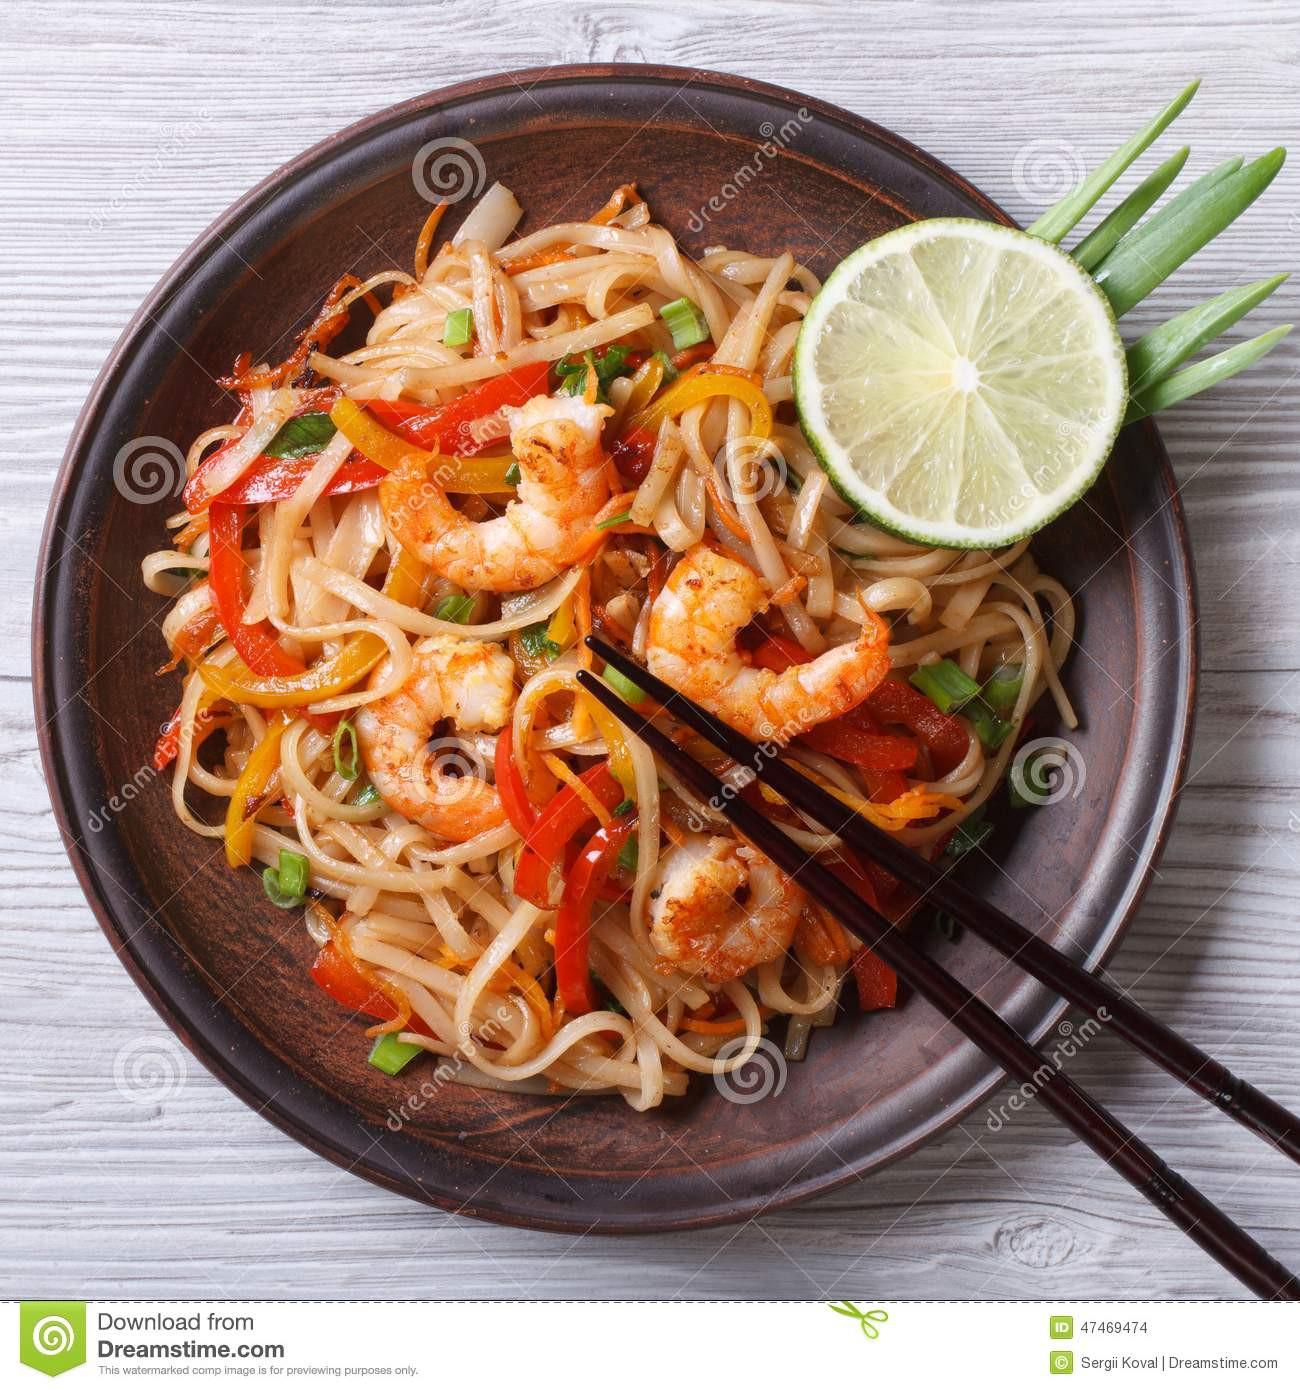 Shrimp Rice Noodles  Delicious Rice Noodles With Shrimp And Ve ables Top View